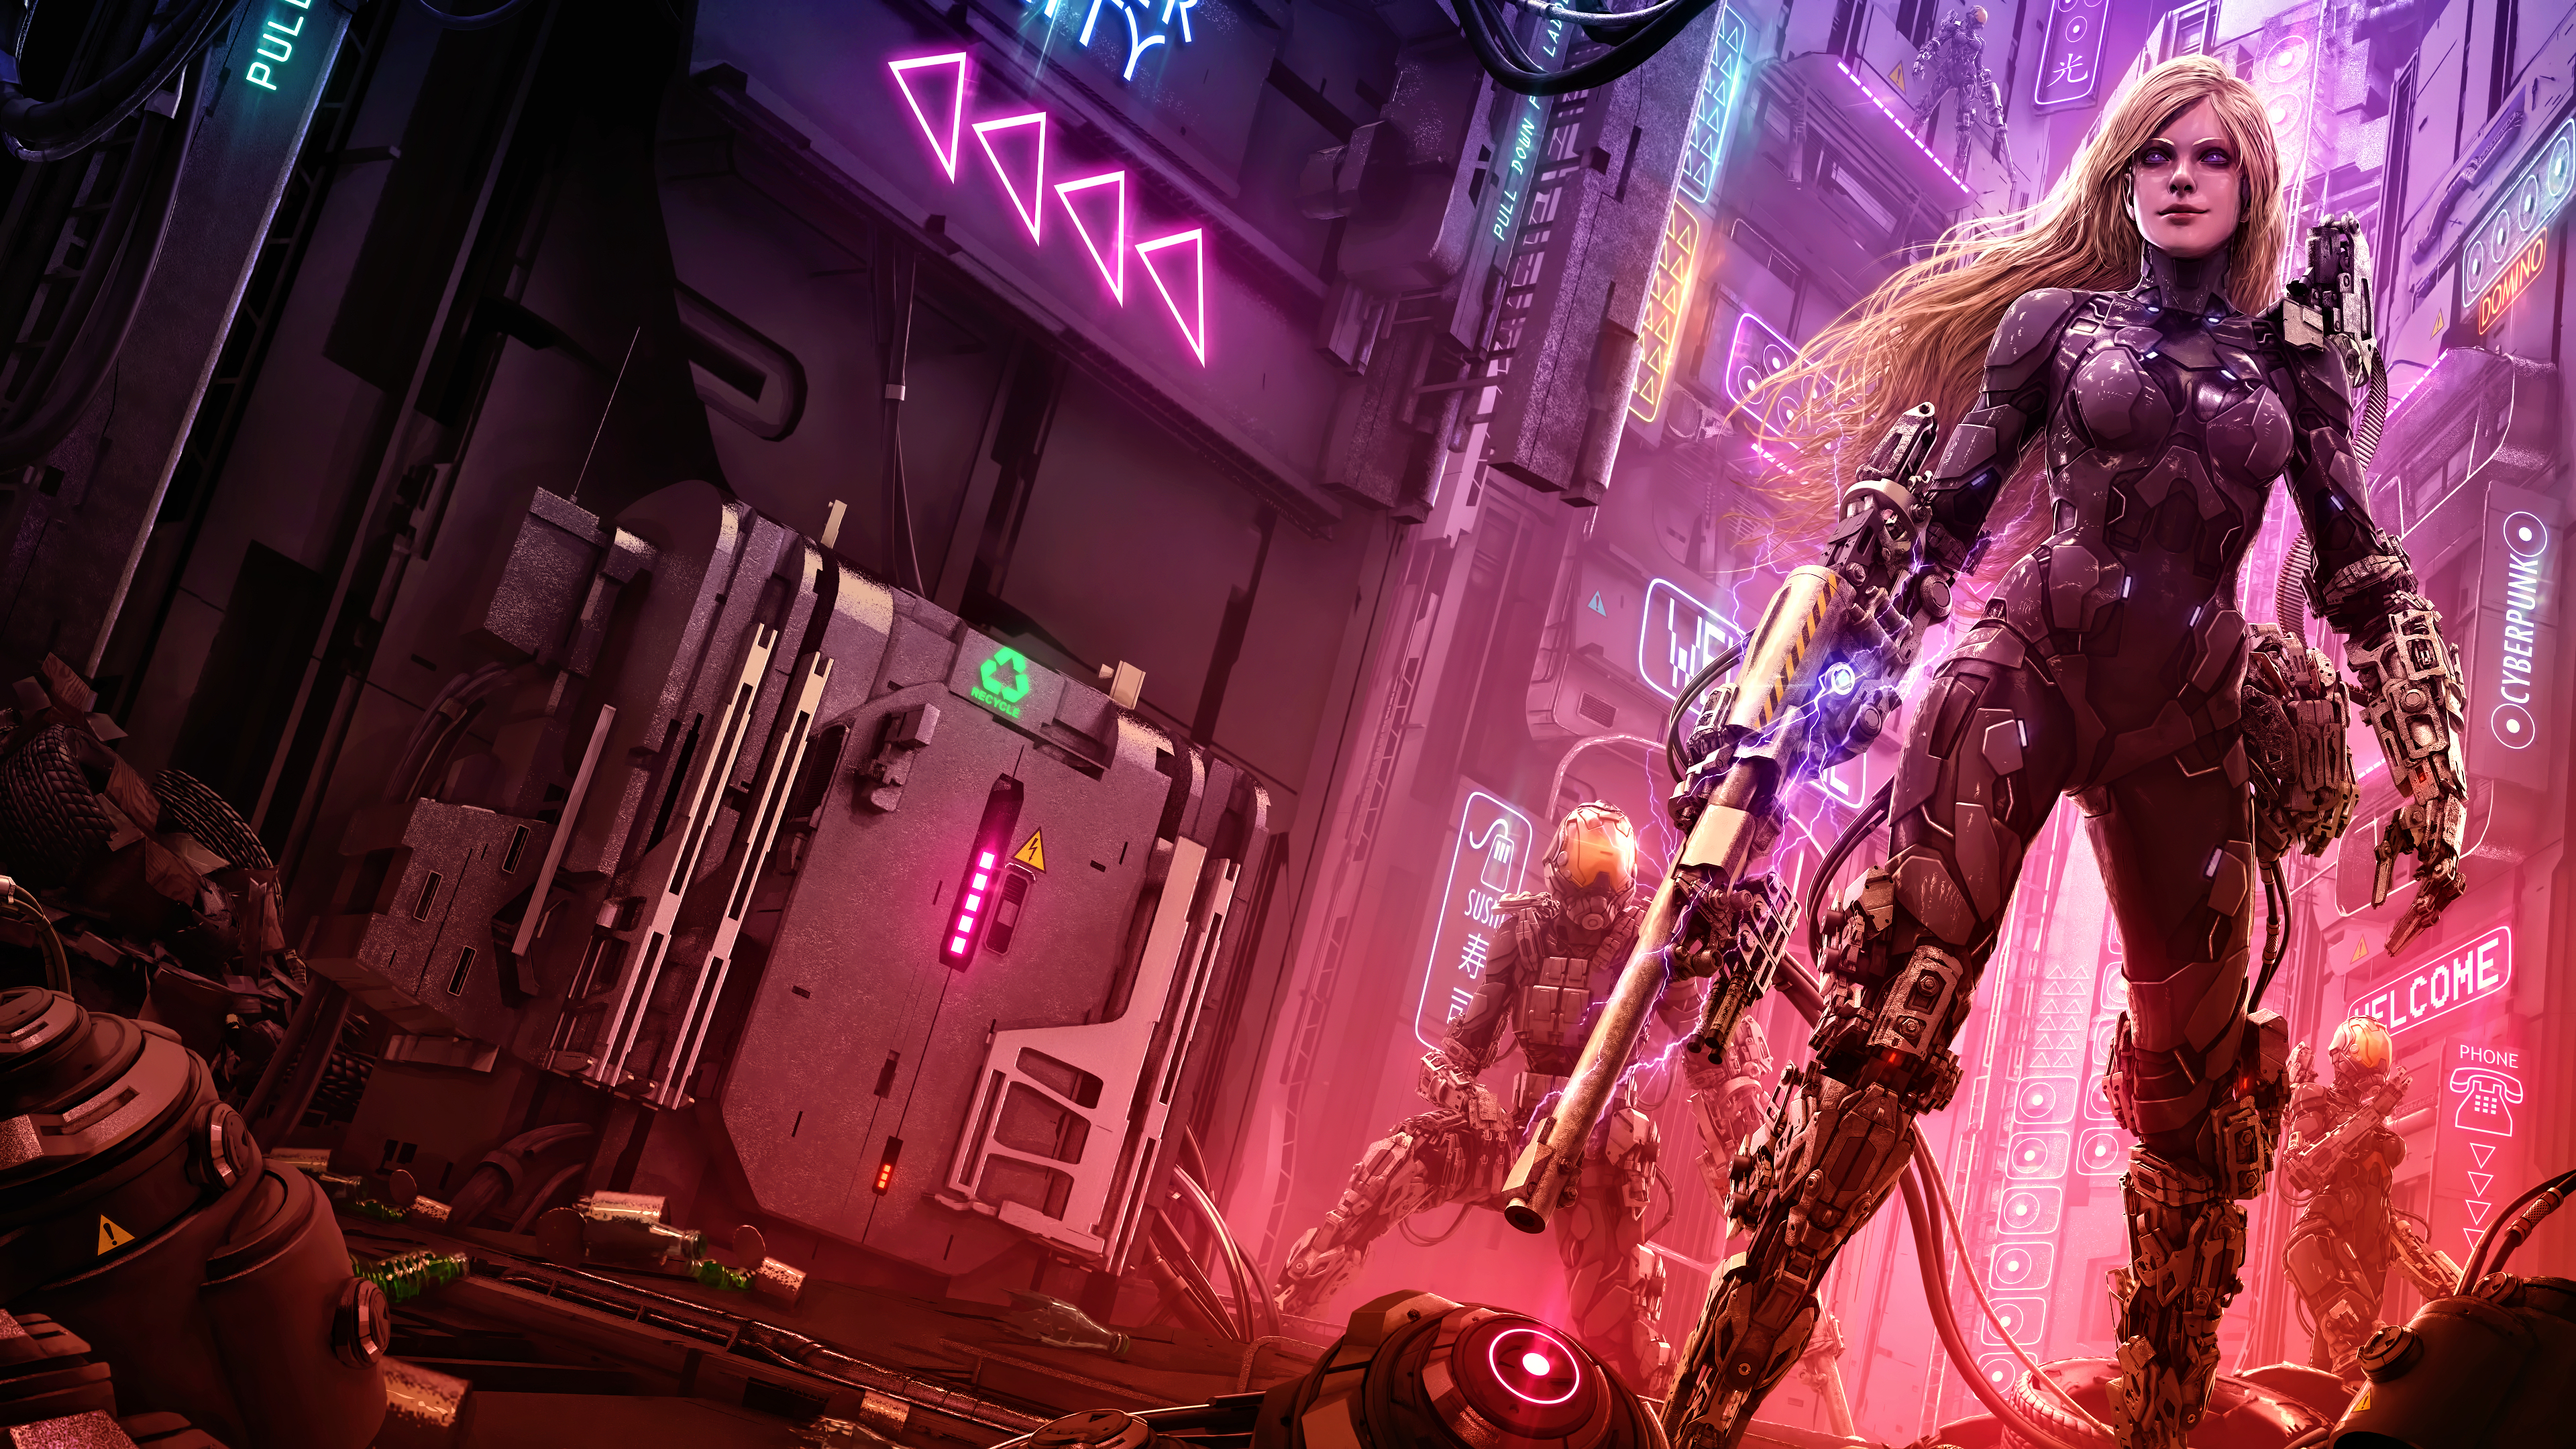 General 3840x2160 cyber science fiction digital art concept art cyberpunk artwork futuristic fantasy art fan art 3D PC gaming cityscape futuristic city CGI futuristic armor blonde neon weapon Tek Tan women